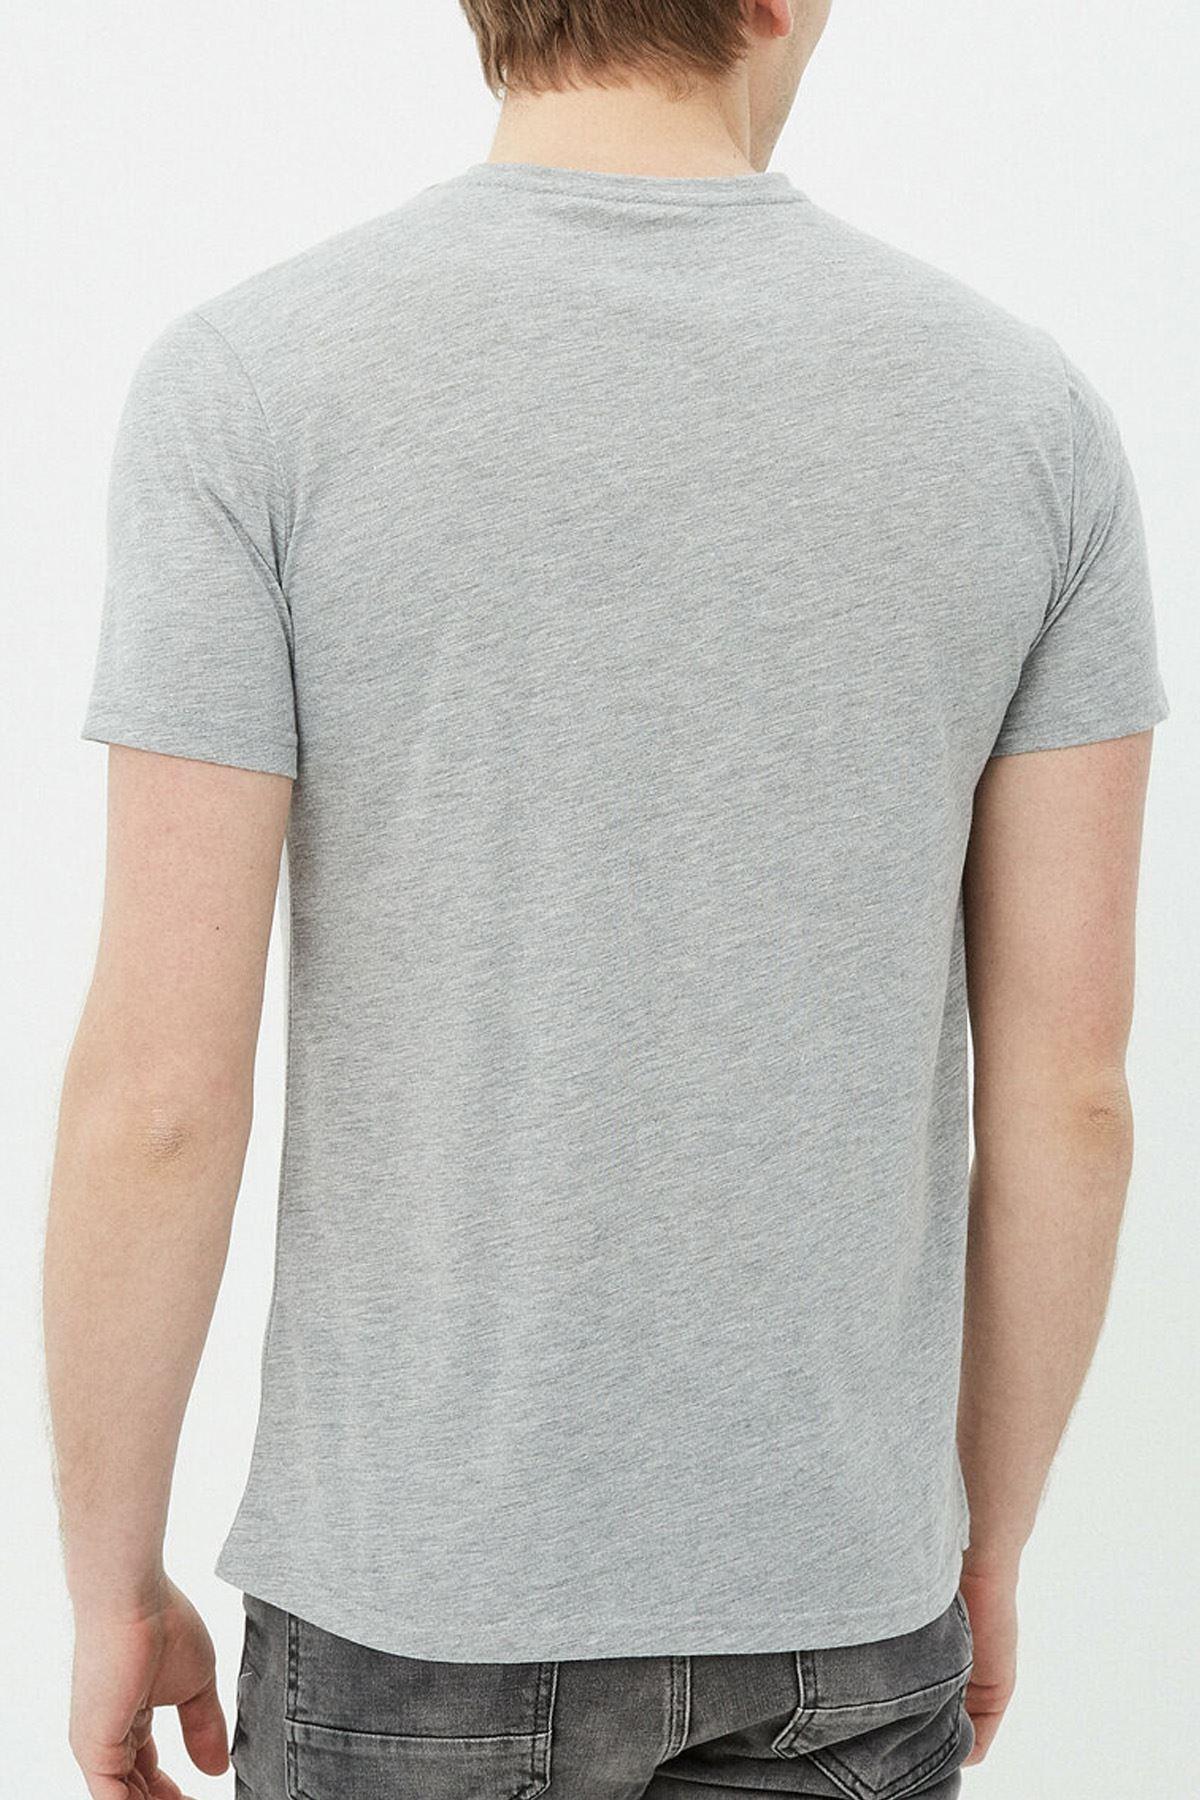 Anime Death Note 06 Gri Erkek Tshirt - Tişört